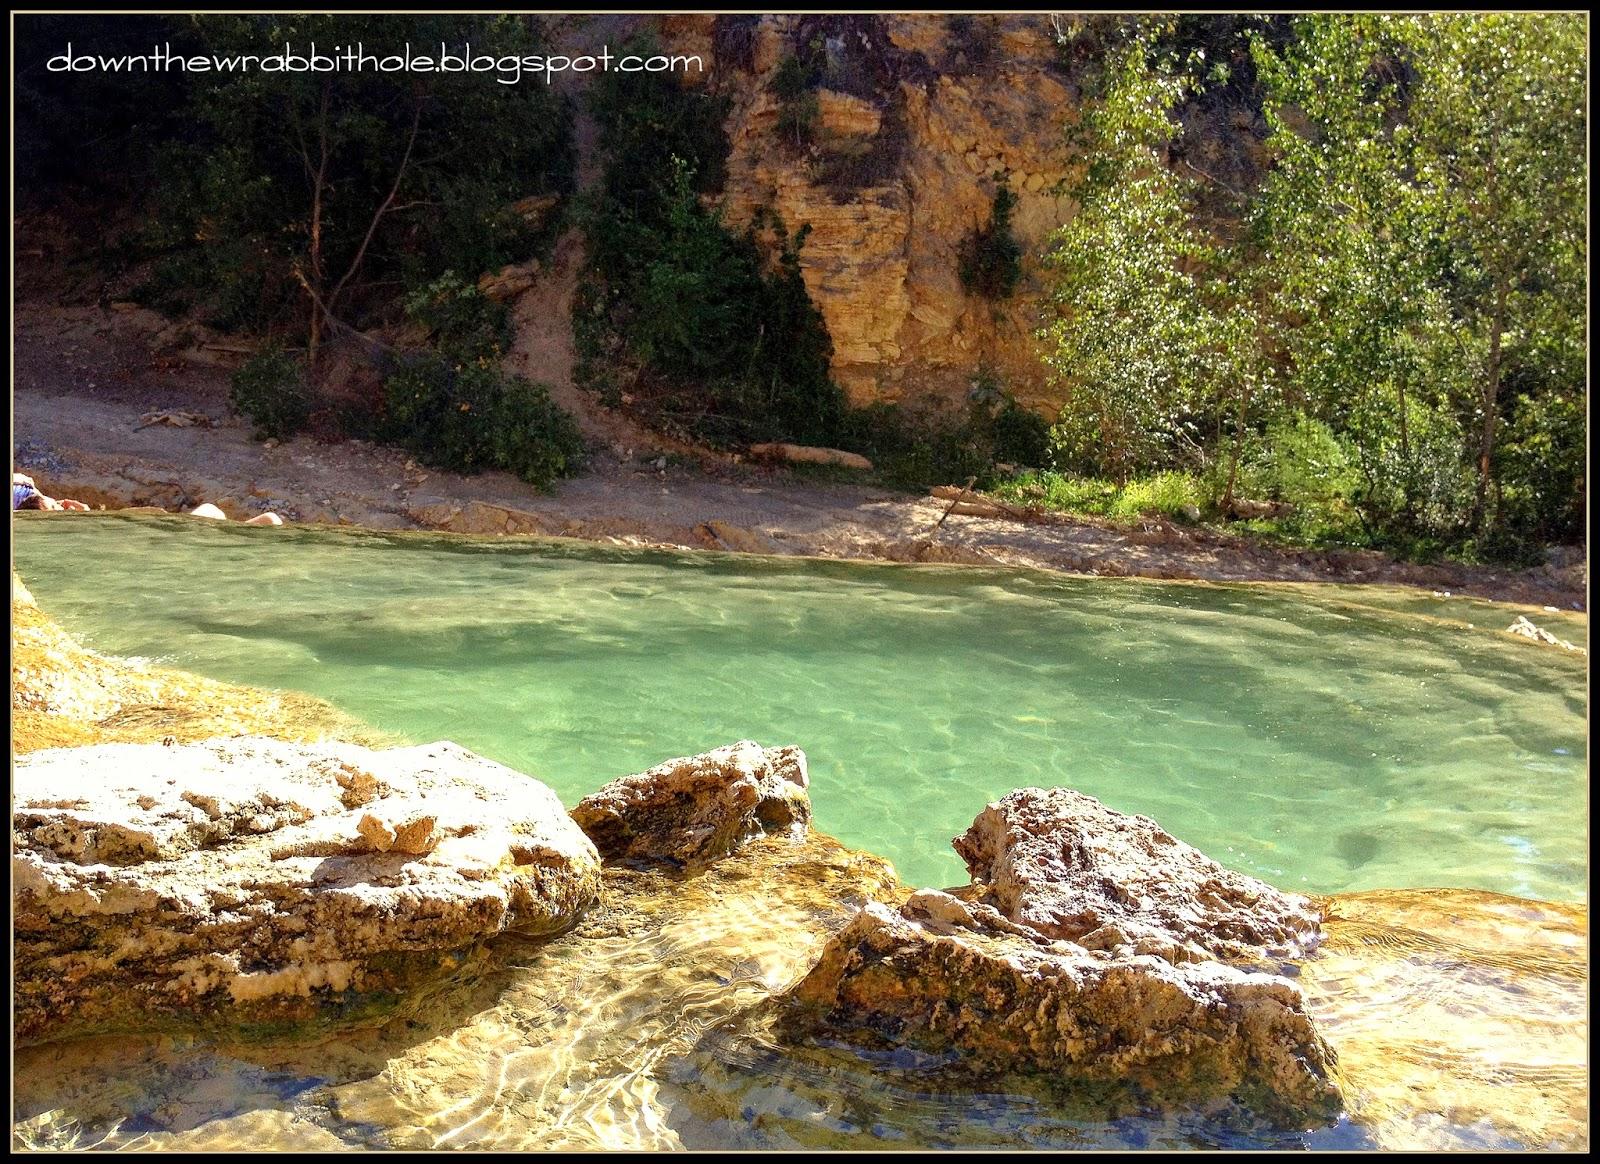 fairmont hot springs, natural hot springs, hot springs in b.c.